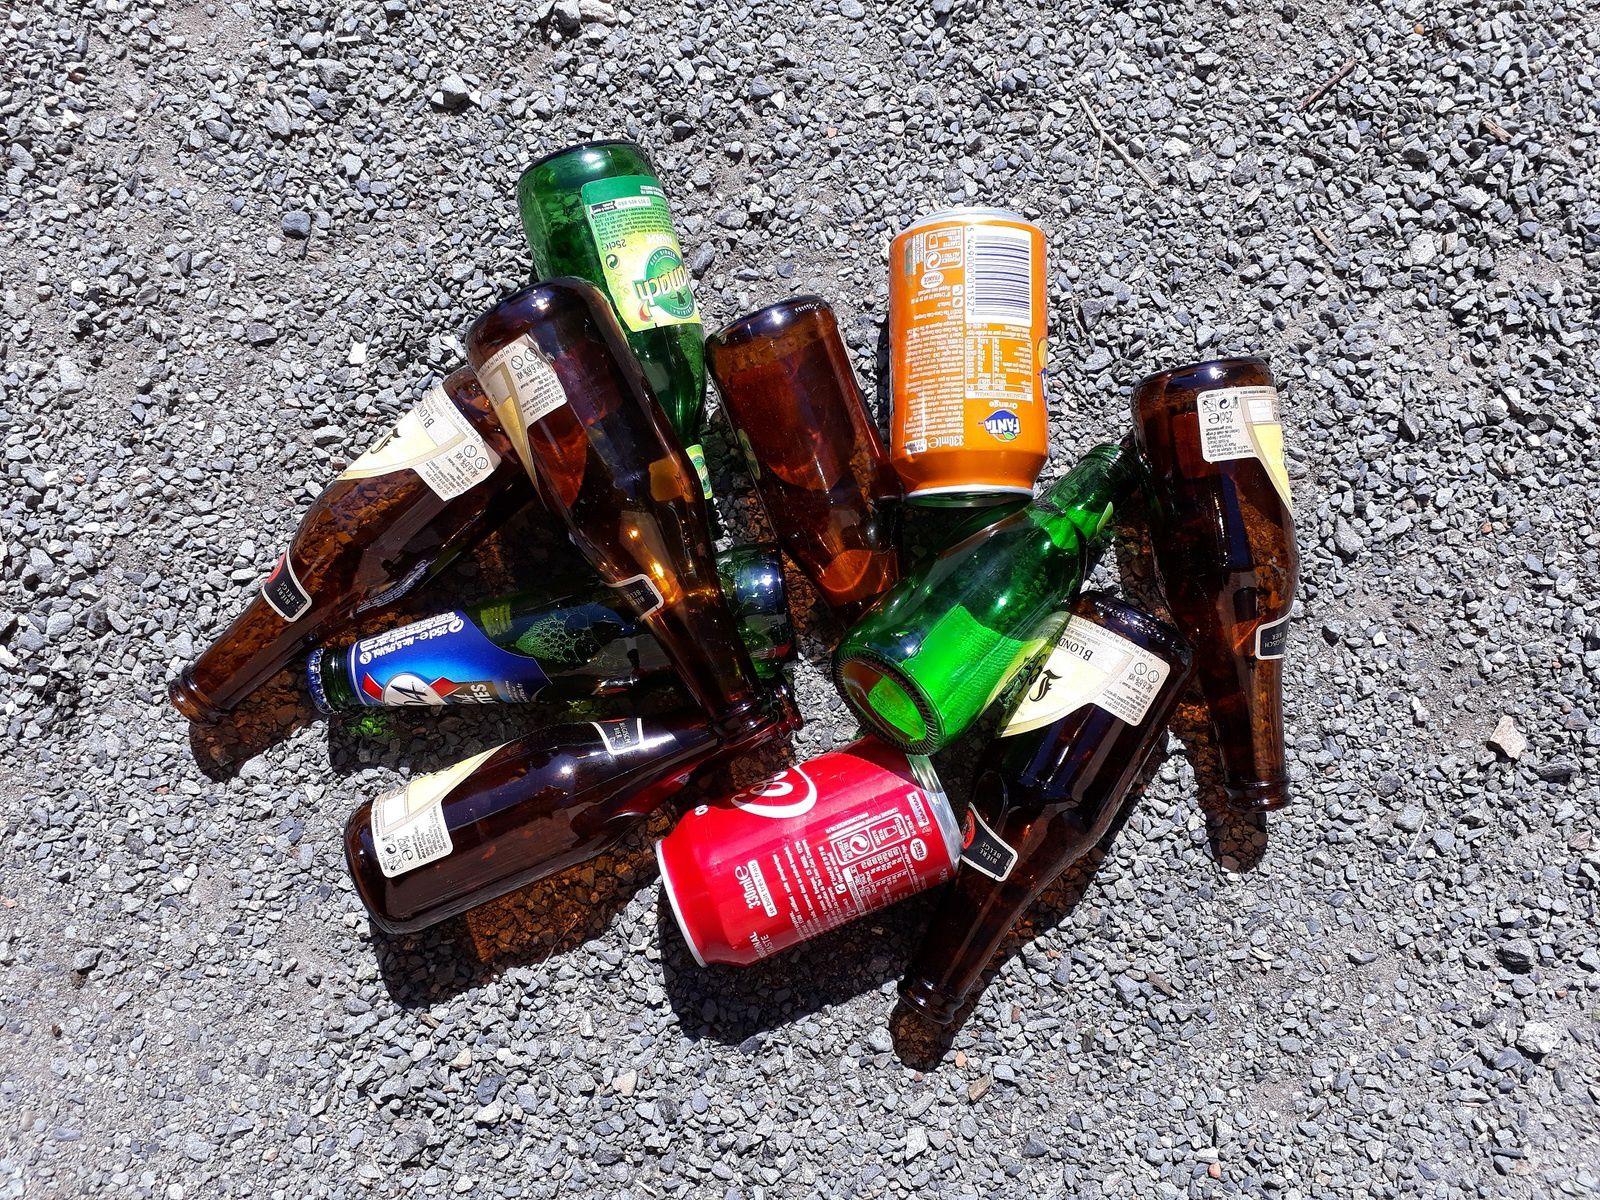 Alcool, toujours, alcool, au secours.